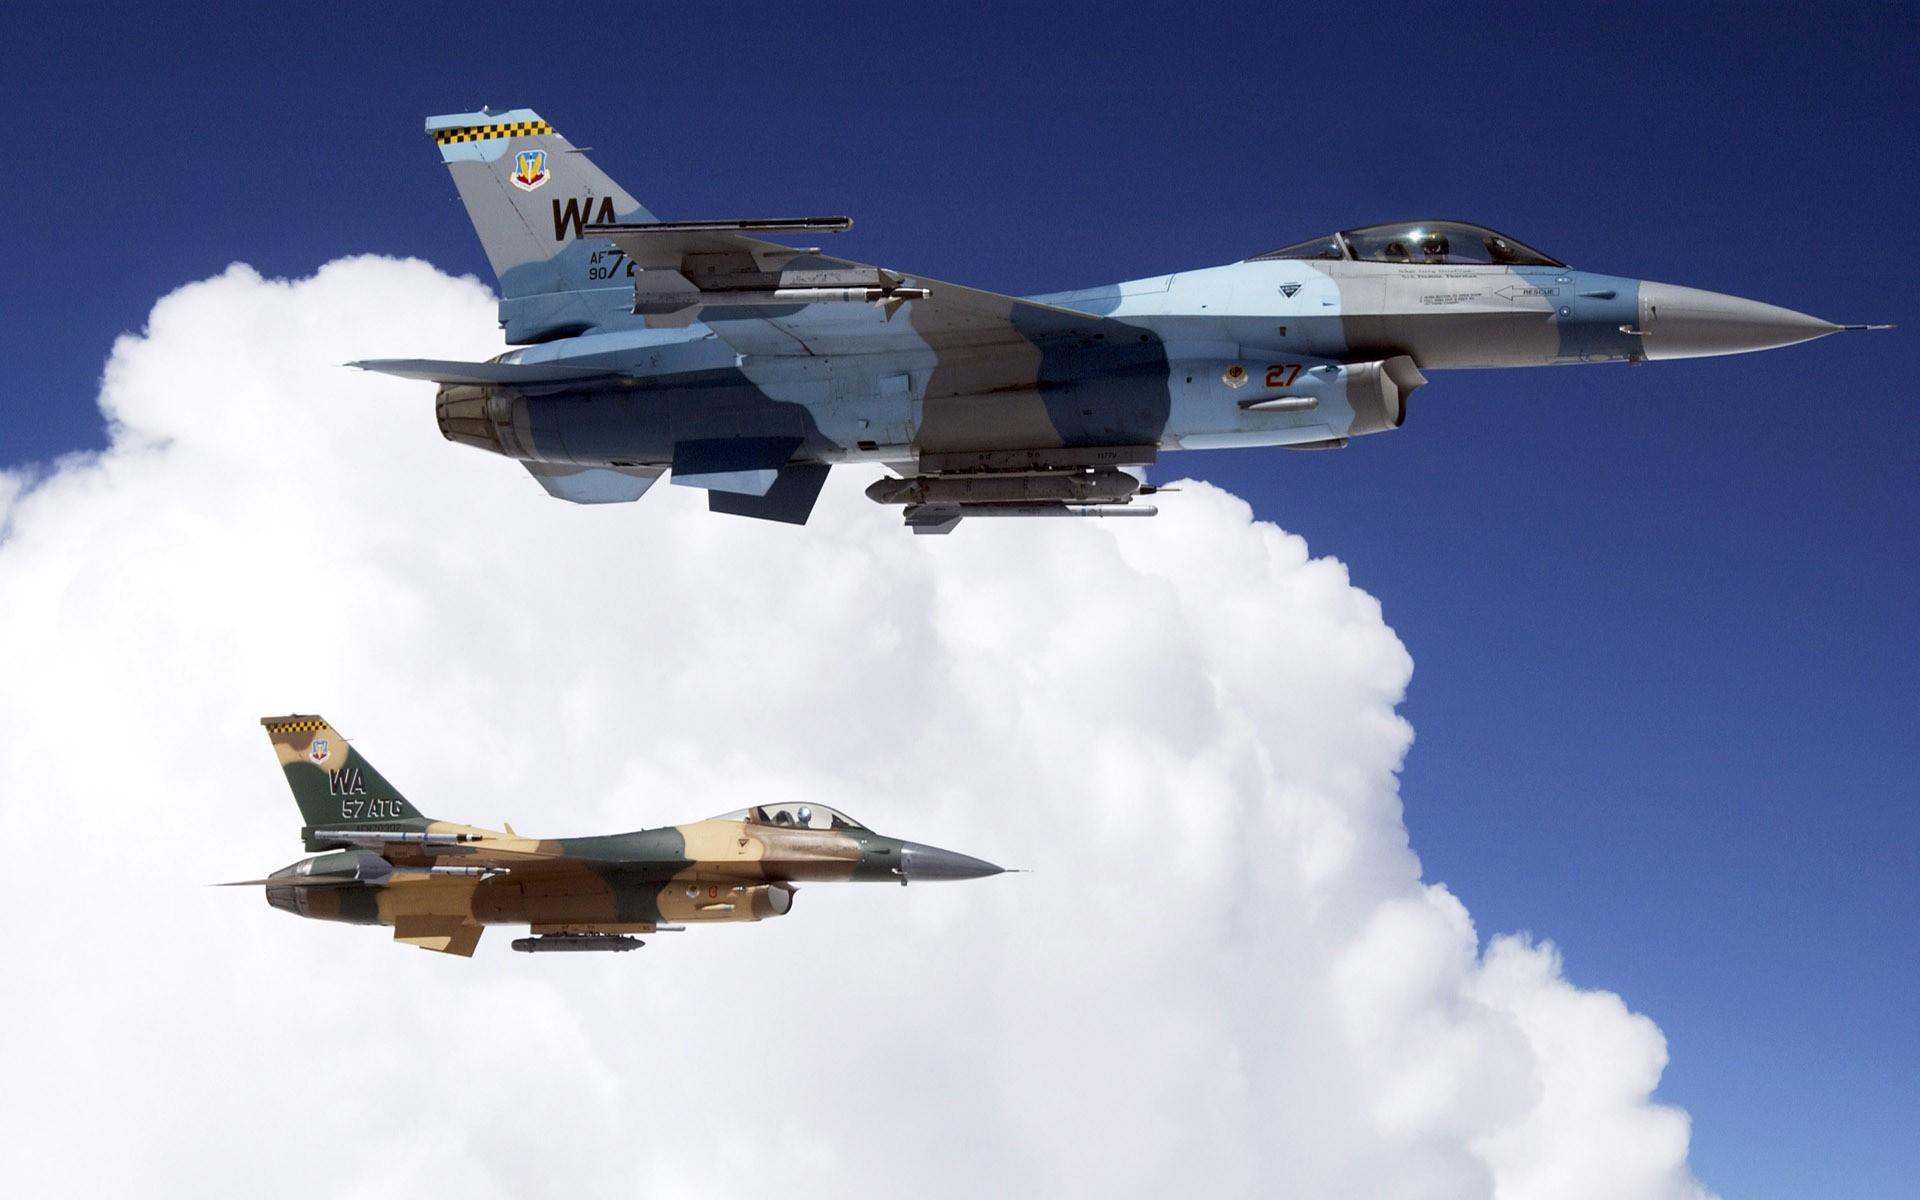 Avion F-16 volando - 1920x1200